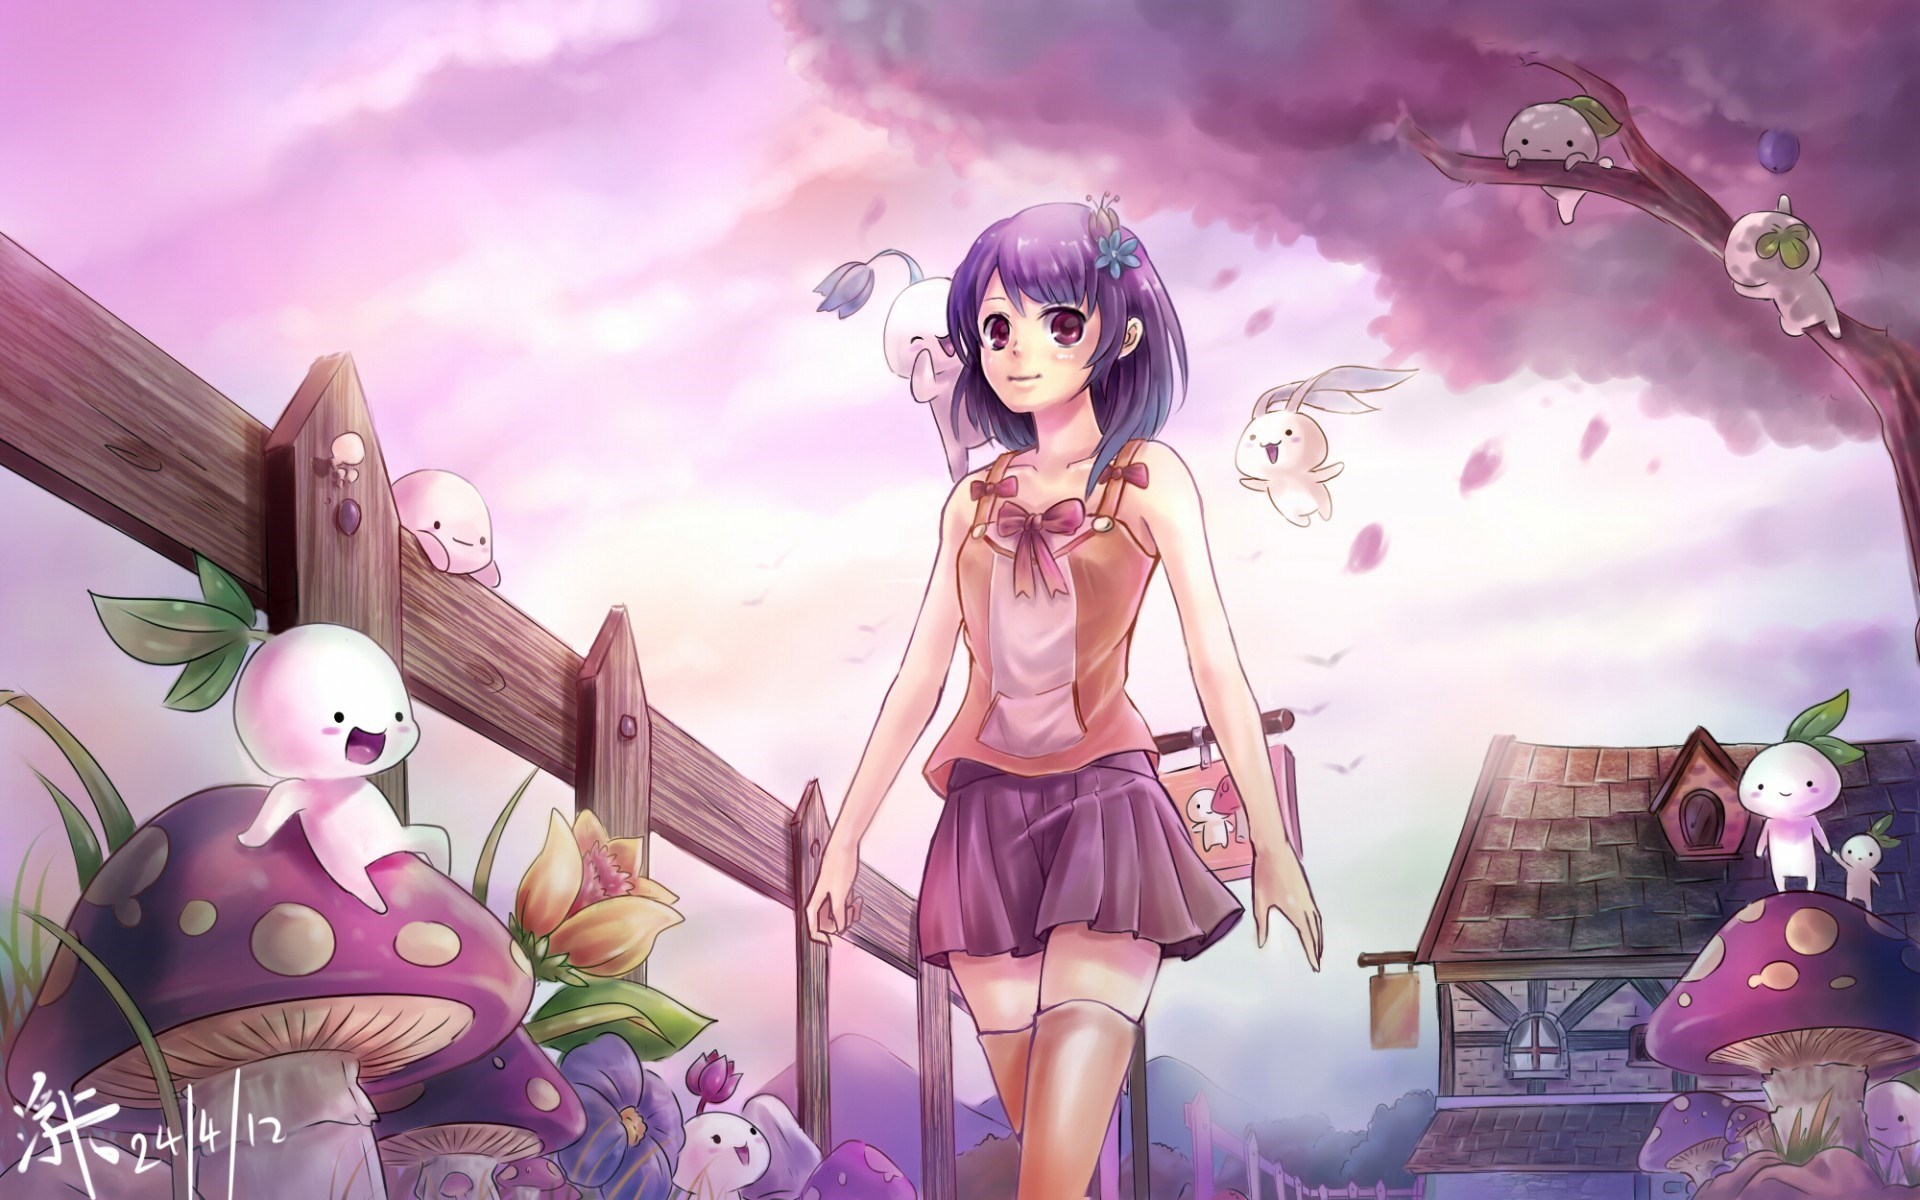 free-download-cute-anime-hd-wallpaper-wp3405883